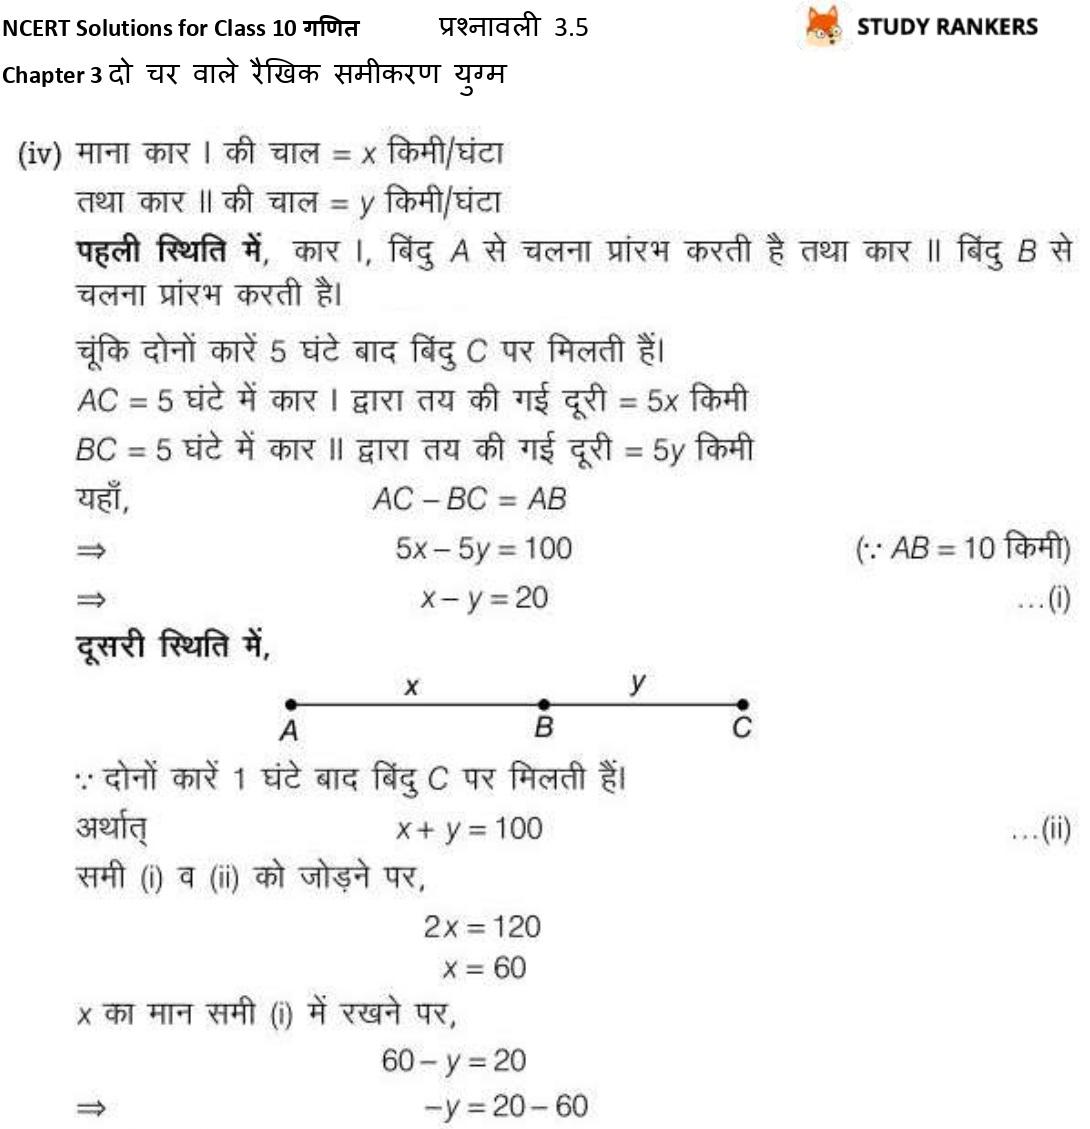 NCERT Solutions for Class 10 Maths Chapter 3 दो चर वाले रैखिक समीकरण युग्म प्रश्नावली 3.5 Part 12